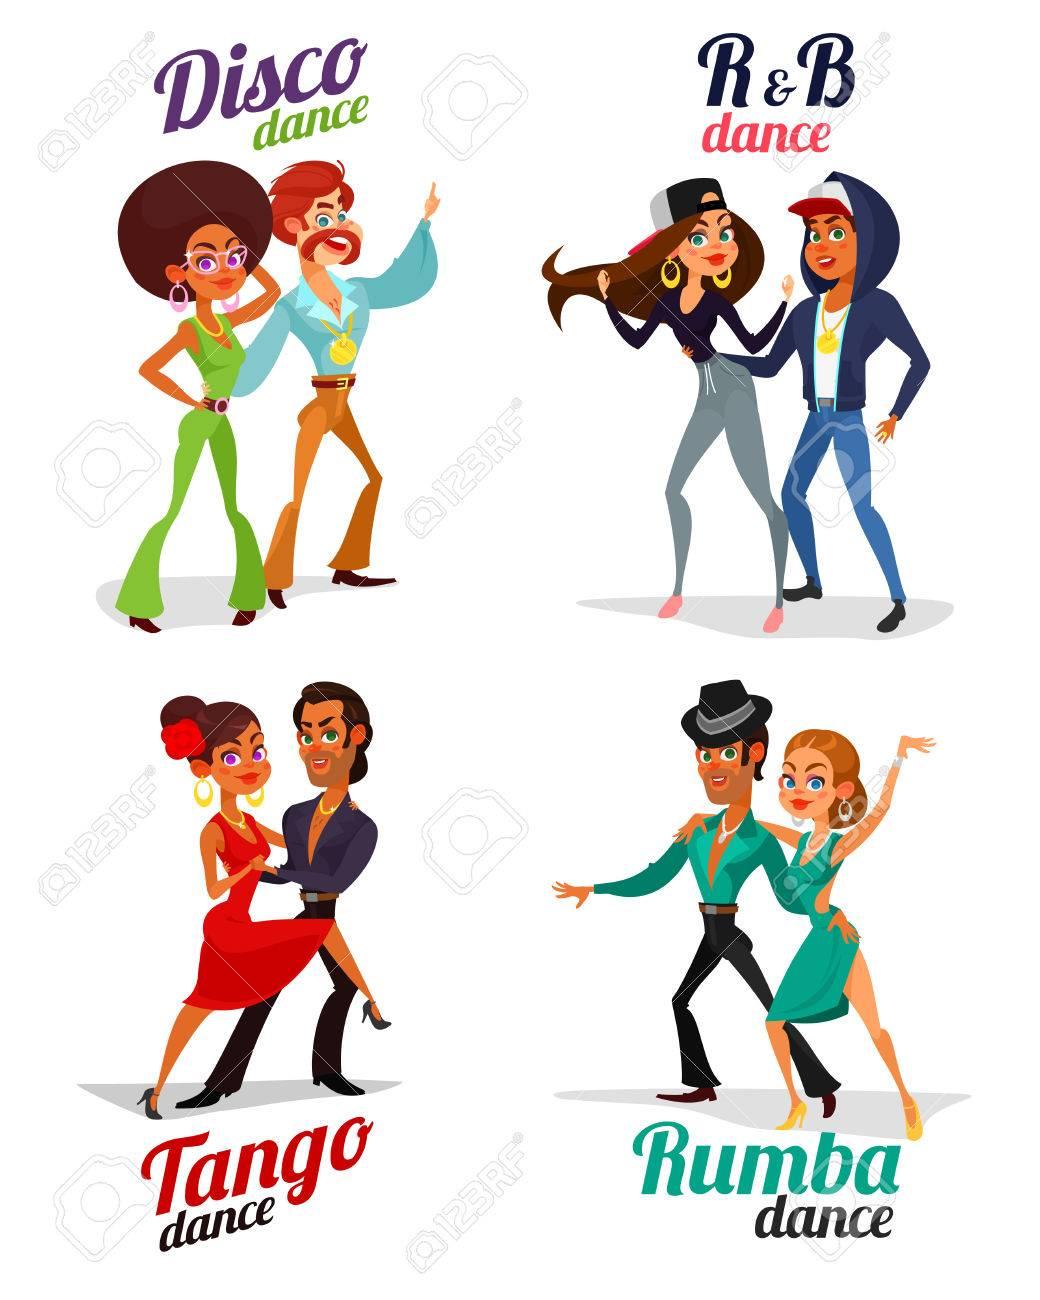 Defina Ilustracoes De Desenhos Animados De Casais Que Dancam Tango